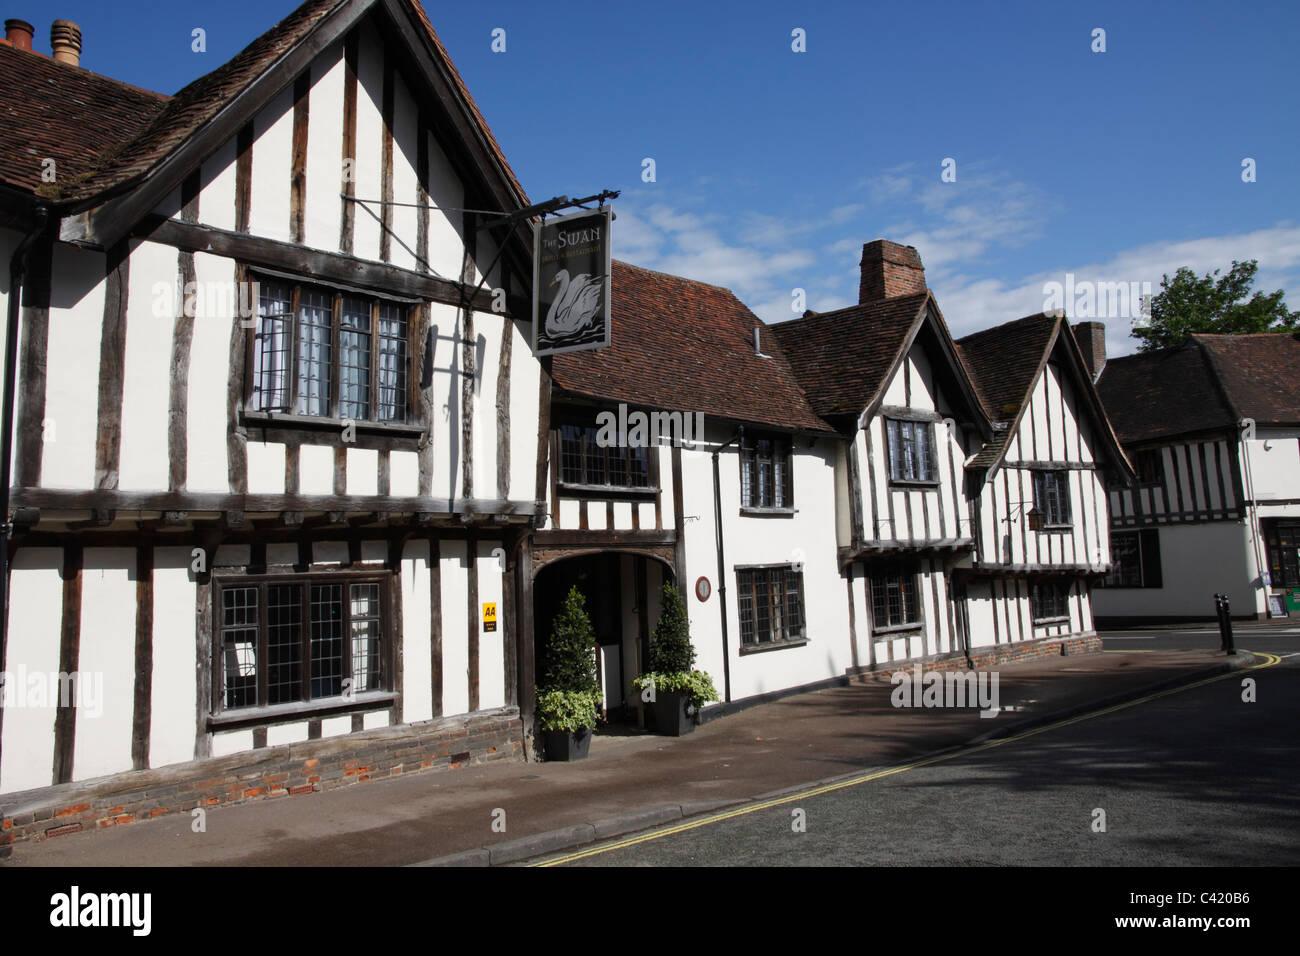 Swan Hotel Lavenham Suffolk - Stock Image